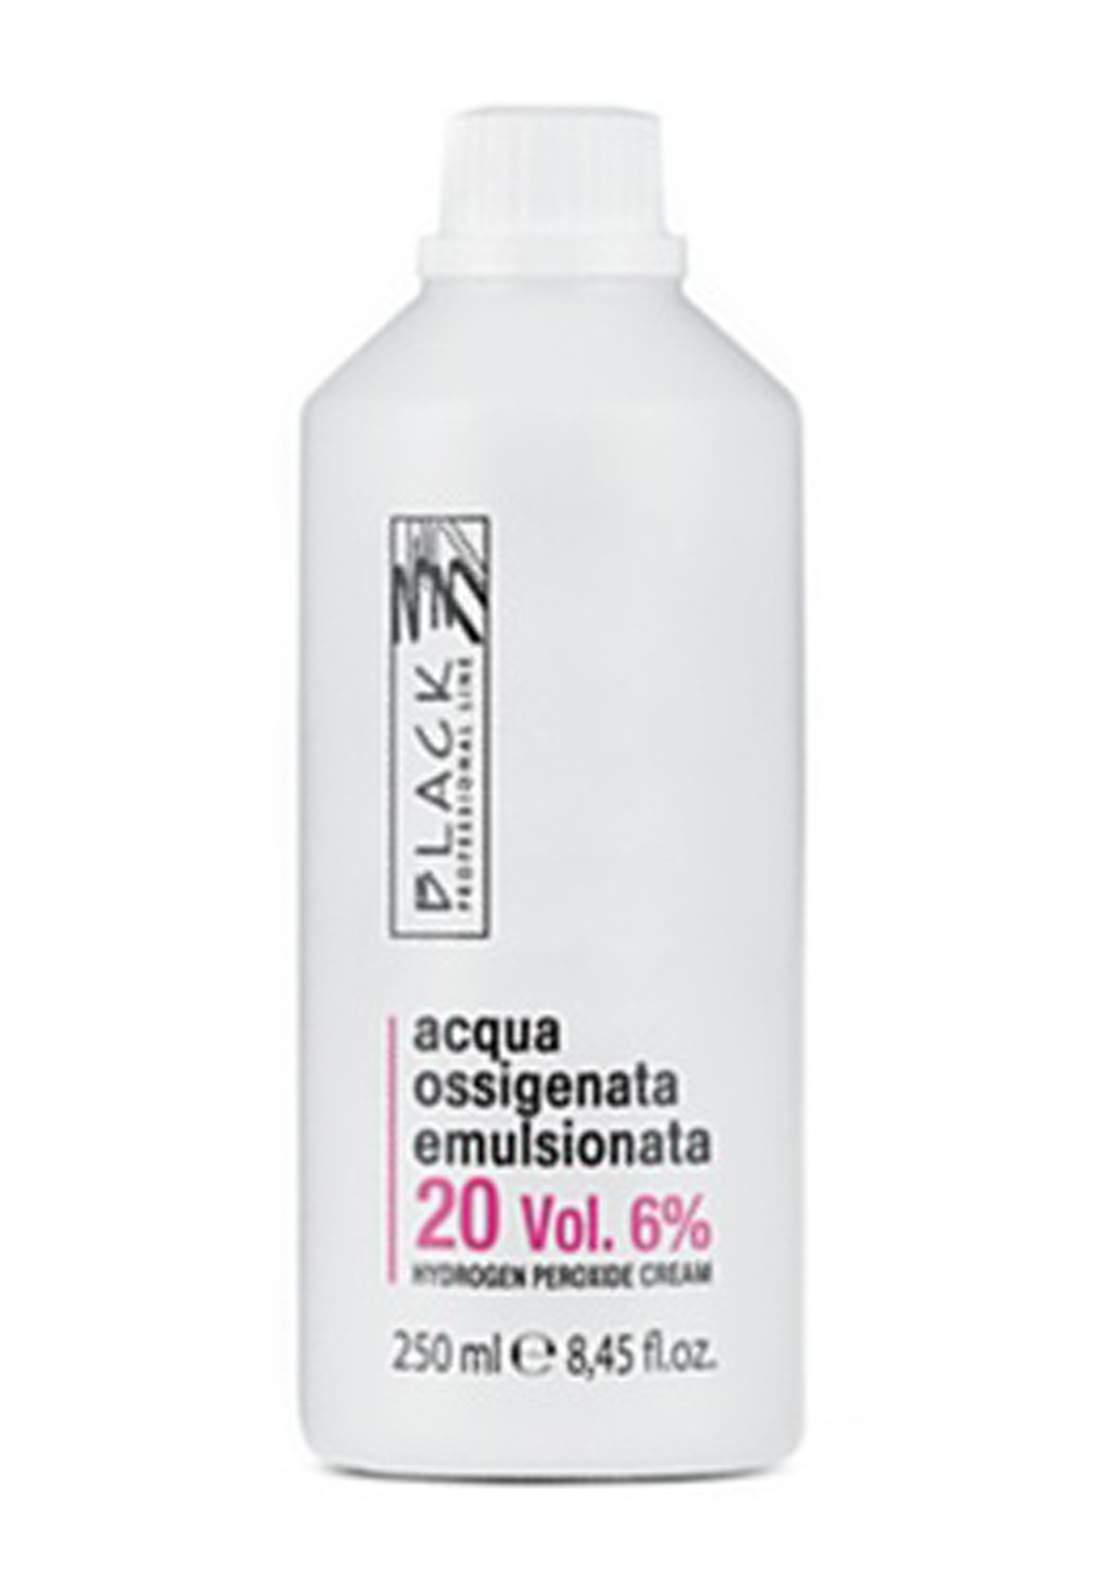 Black Professional Creamy 6% Hydrogen Peroxide 250ml - Oxidizing Cream 20vol كريم مؤكسد للصبغة